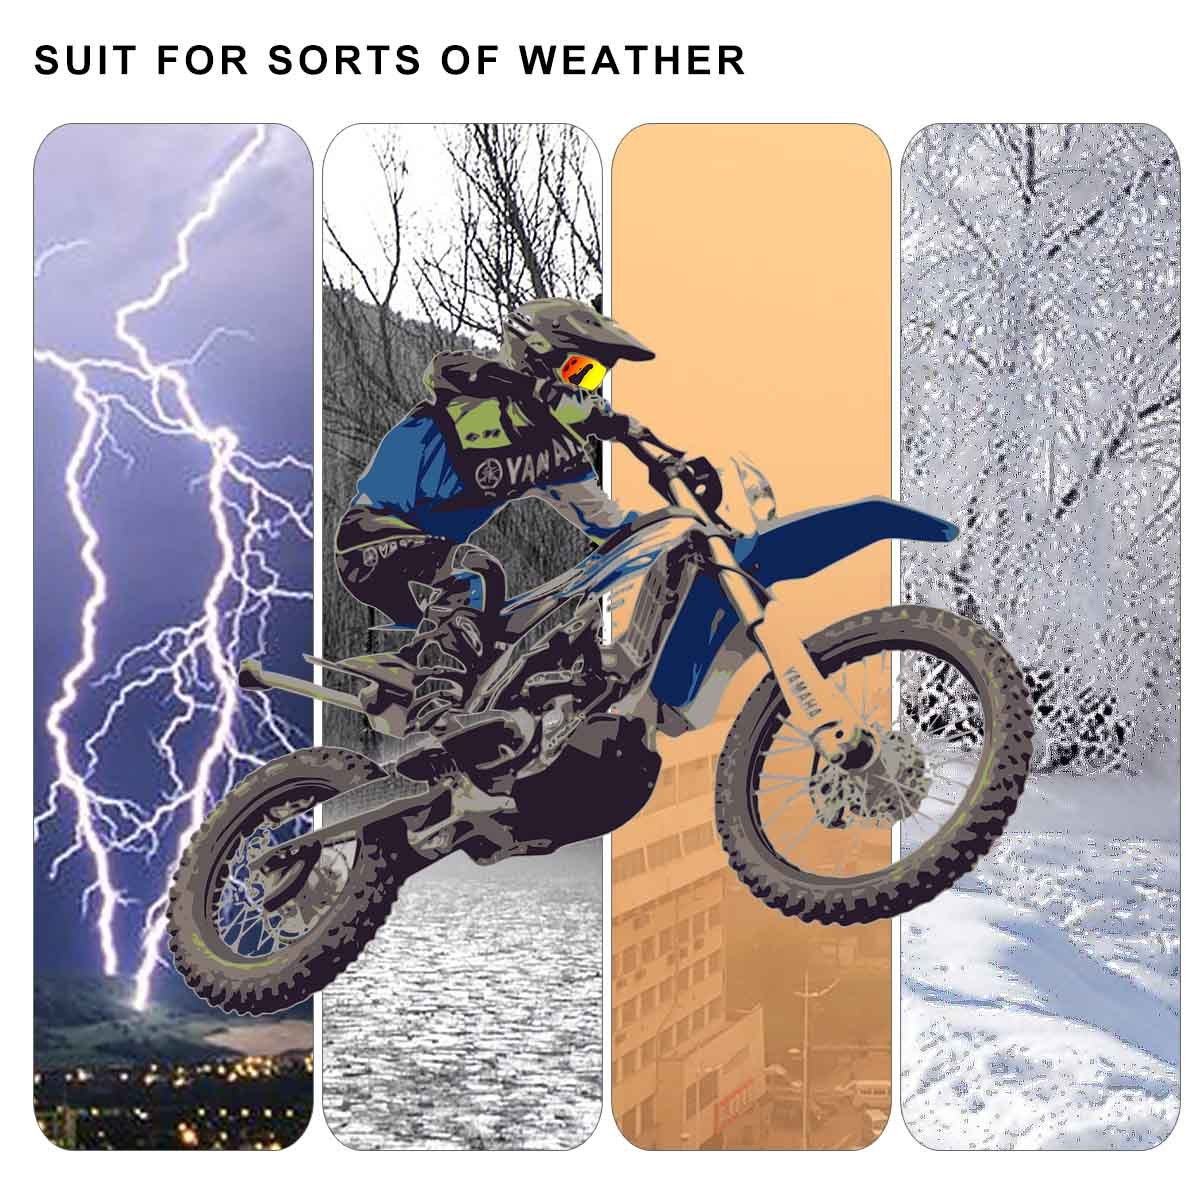 KAWELL Motorrad Schalter Drehen Signal-Horn//Head Light 7//20,3/cm Lenker Schalter f/ür Motorrad electrombiles gel/ändefahrzeugen Roller Snowmobile Entwickelt